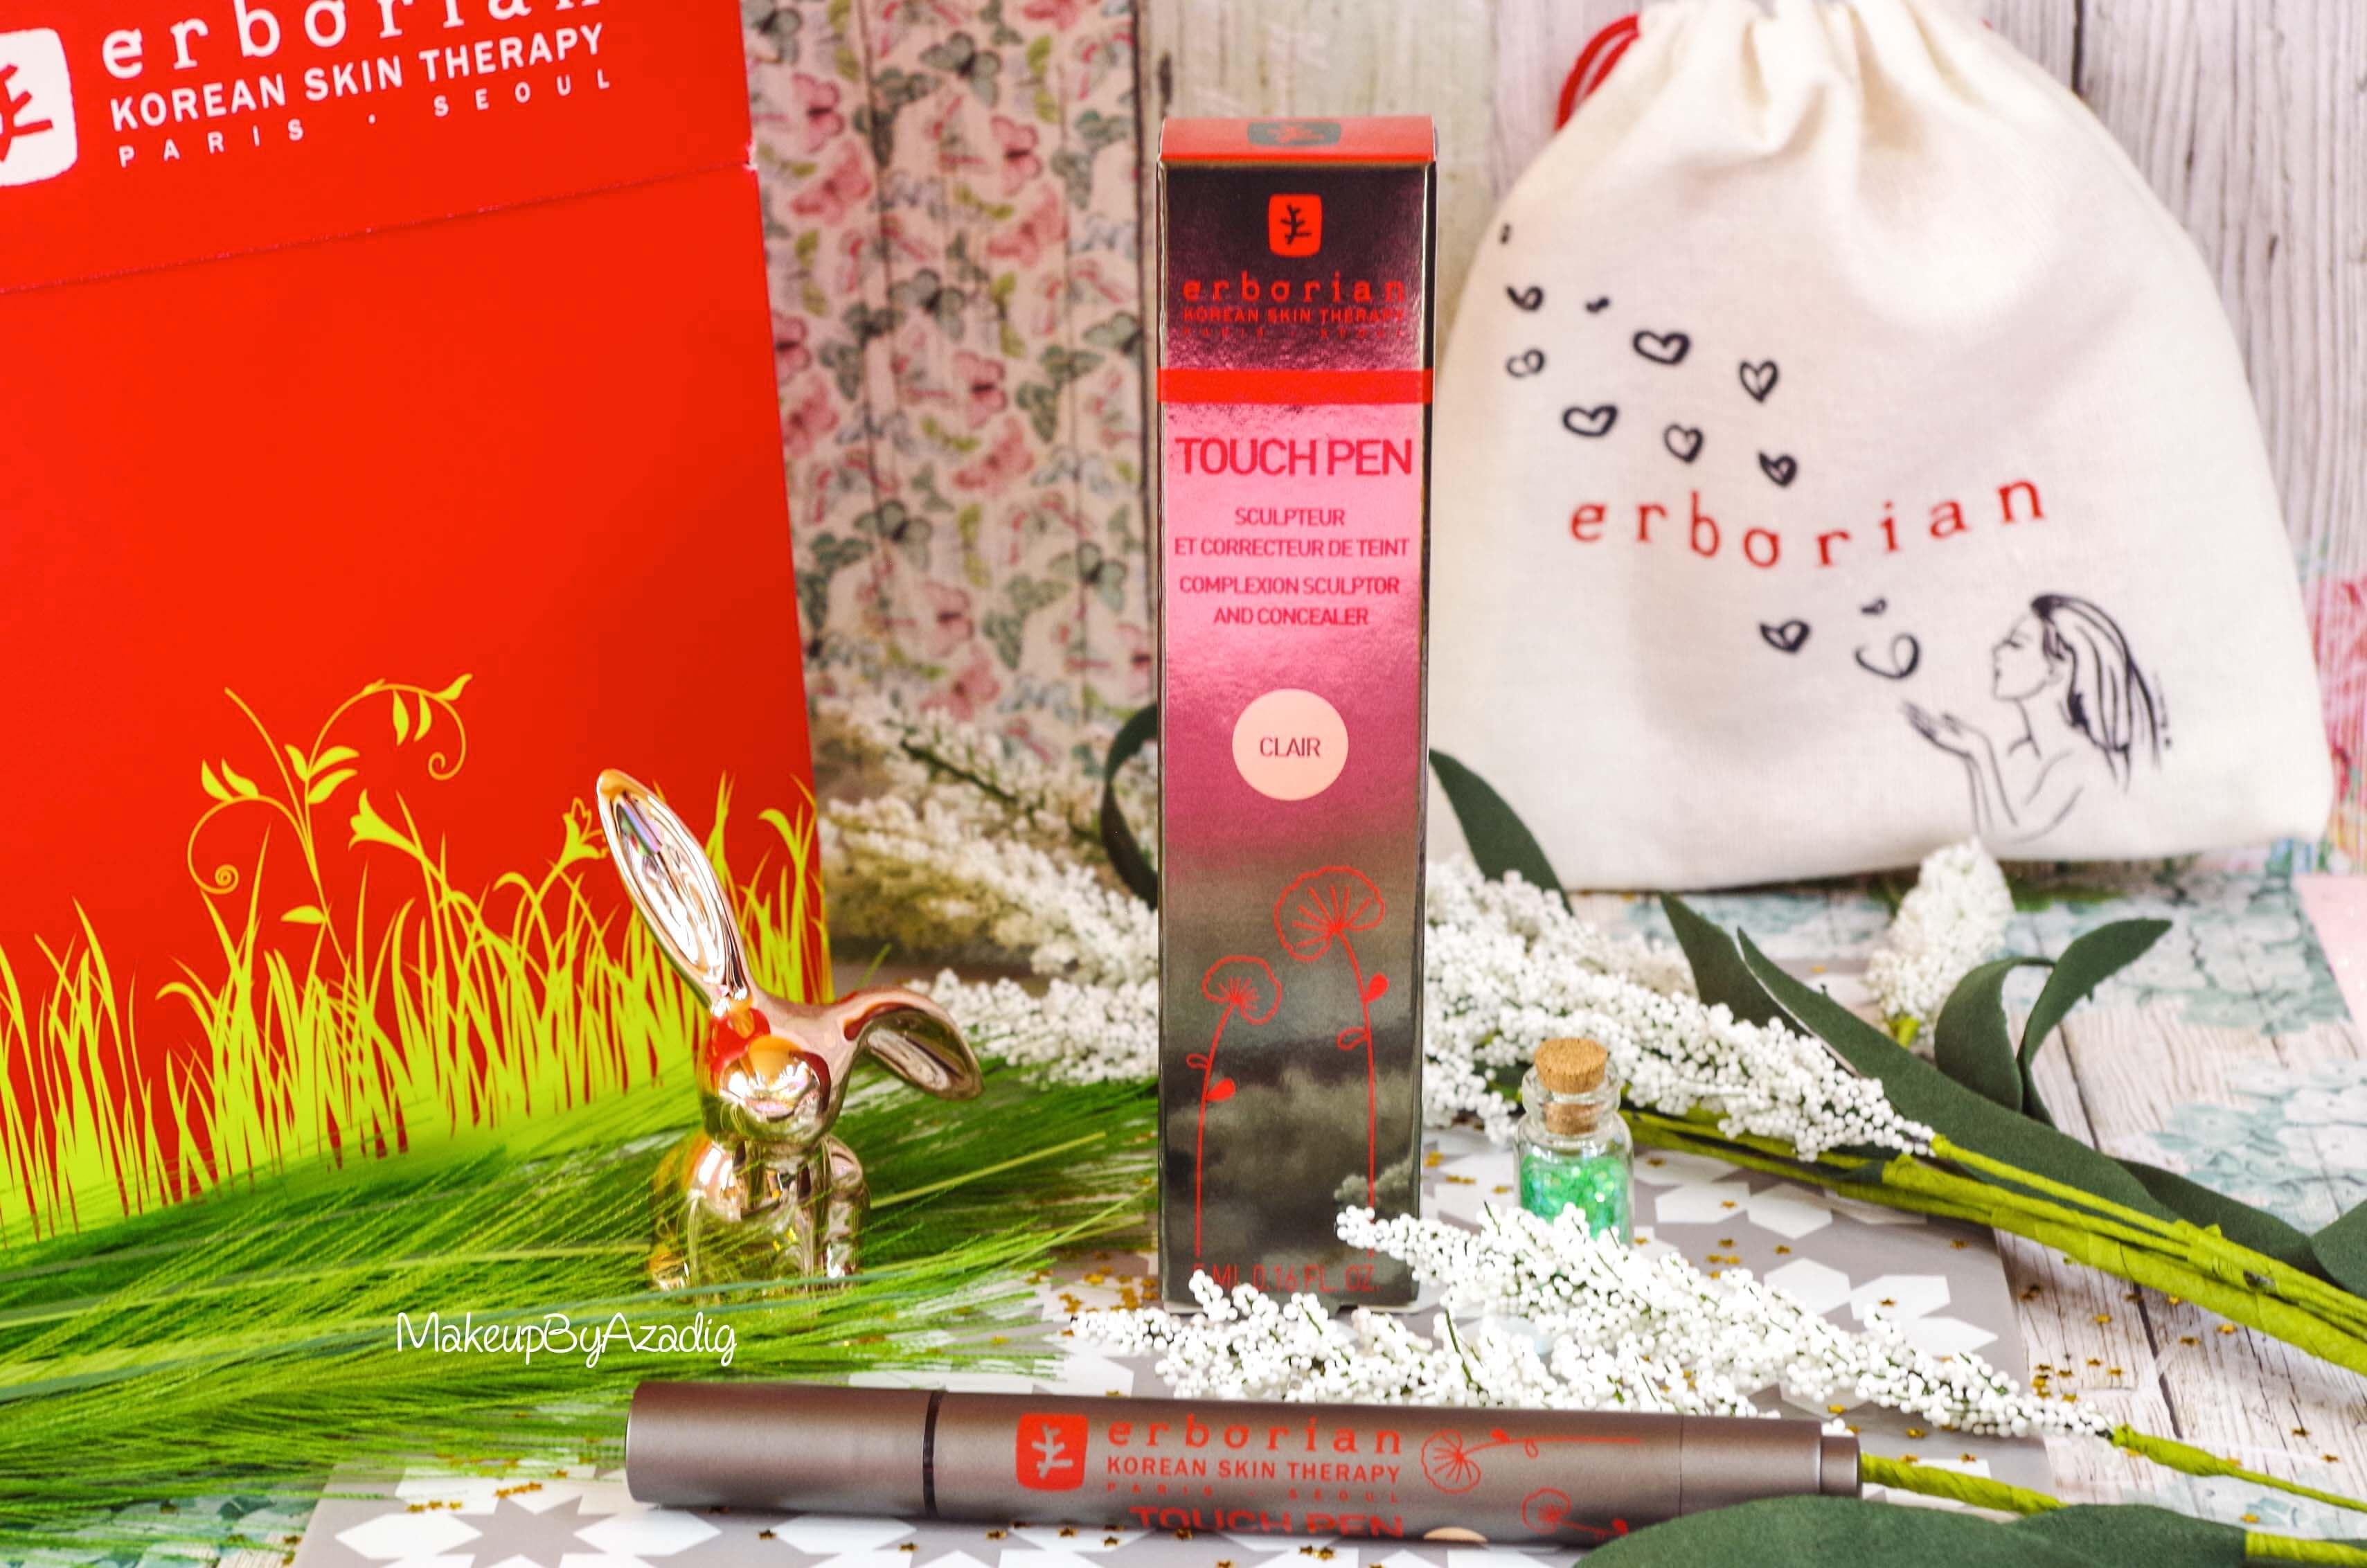 revue-nouveaute-erborian-touch-pen-zones-de-lumiere-visage-makeupbyazadig-korean